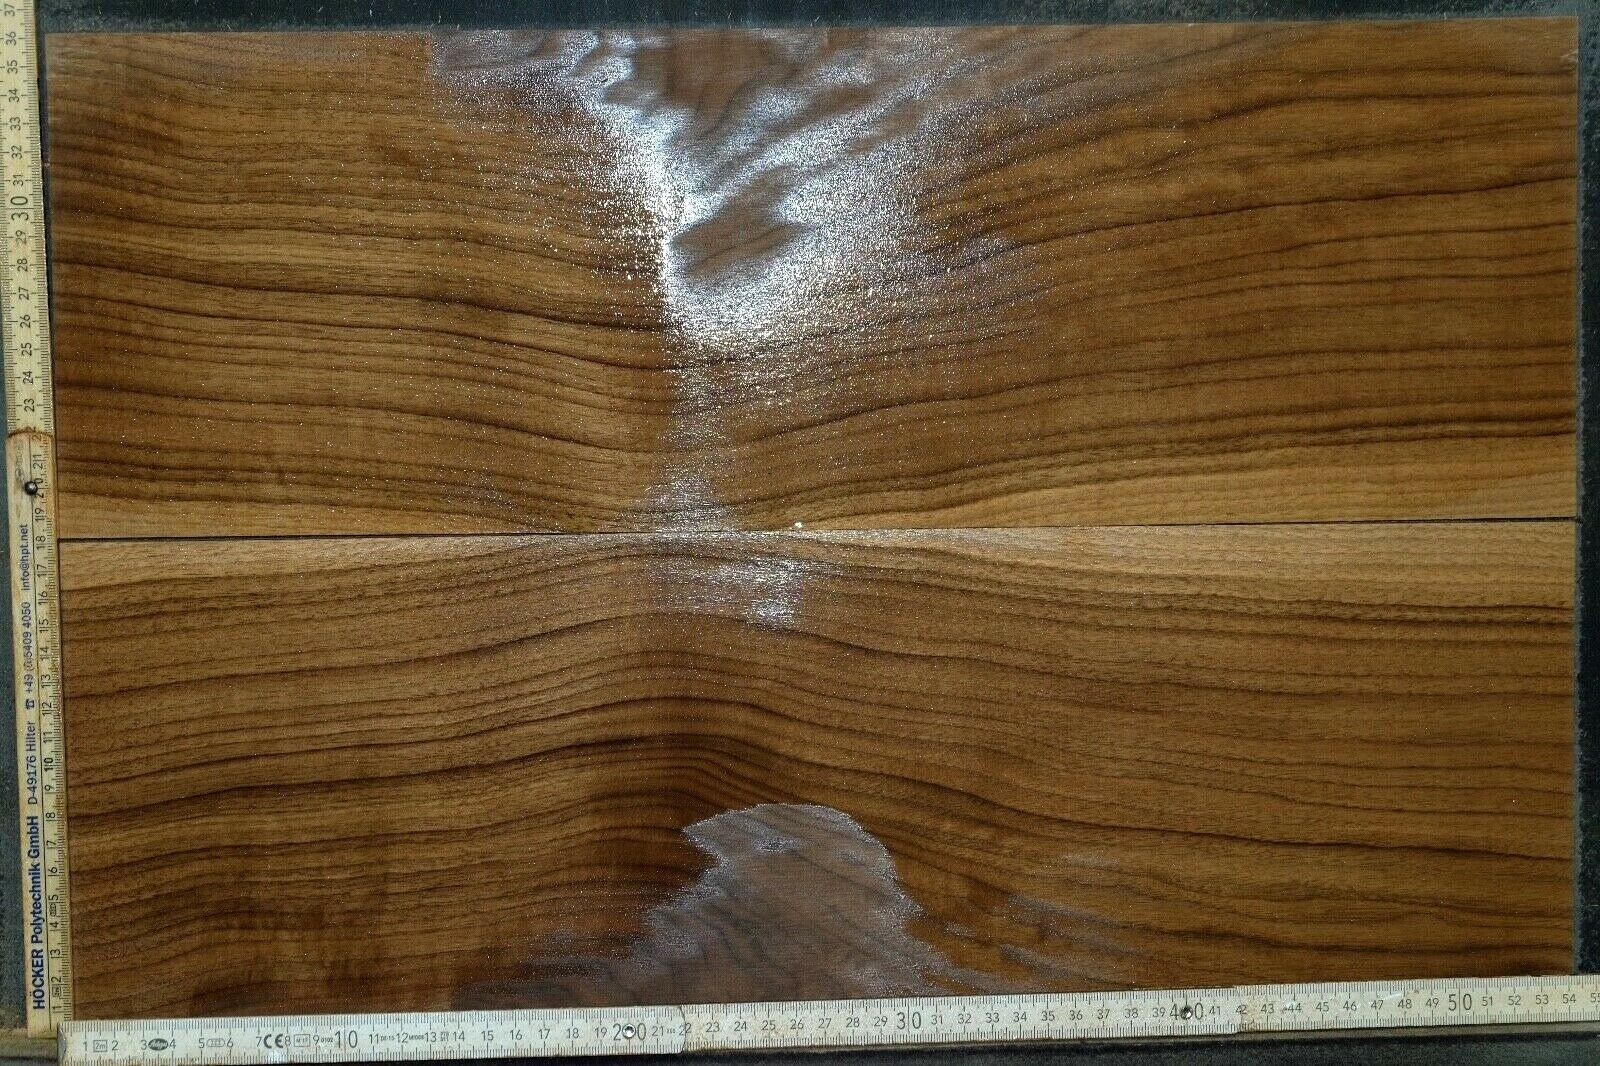 caldo Tonewood nero Walnut ALLUNGABILE 0,65 cm cm cm aufleimer Guitar Top Tonholz DropTop 106  prezzi bassi di tutti i giorni